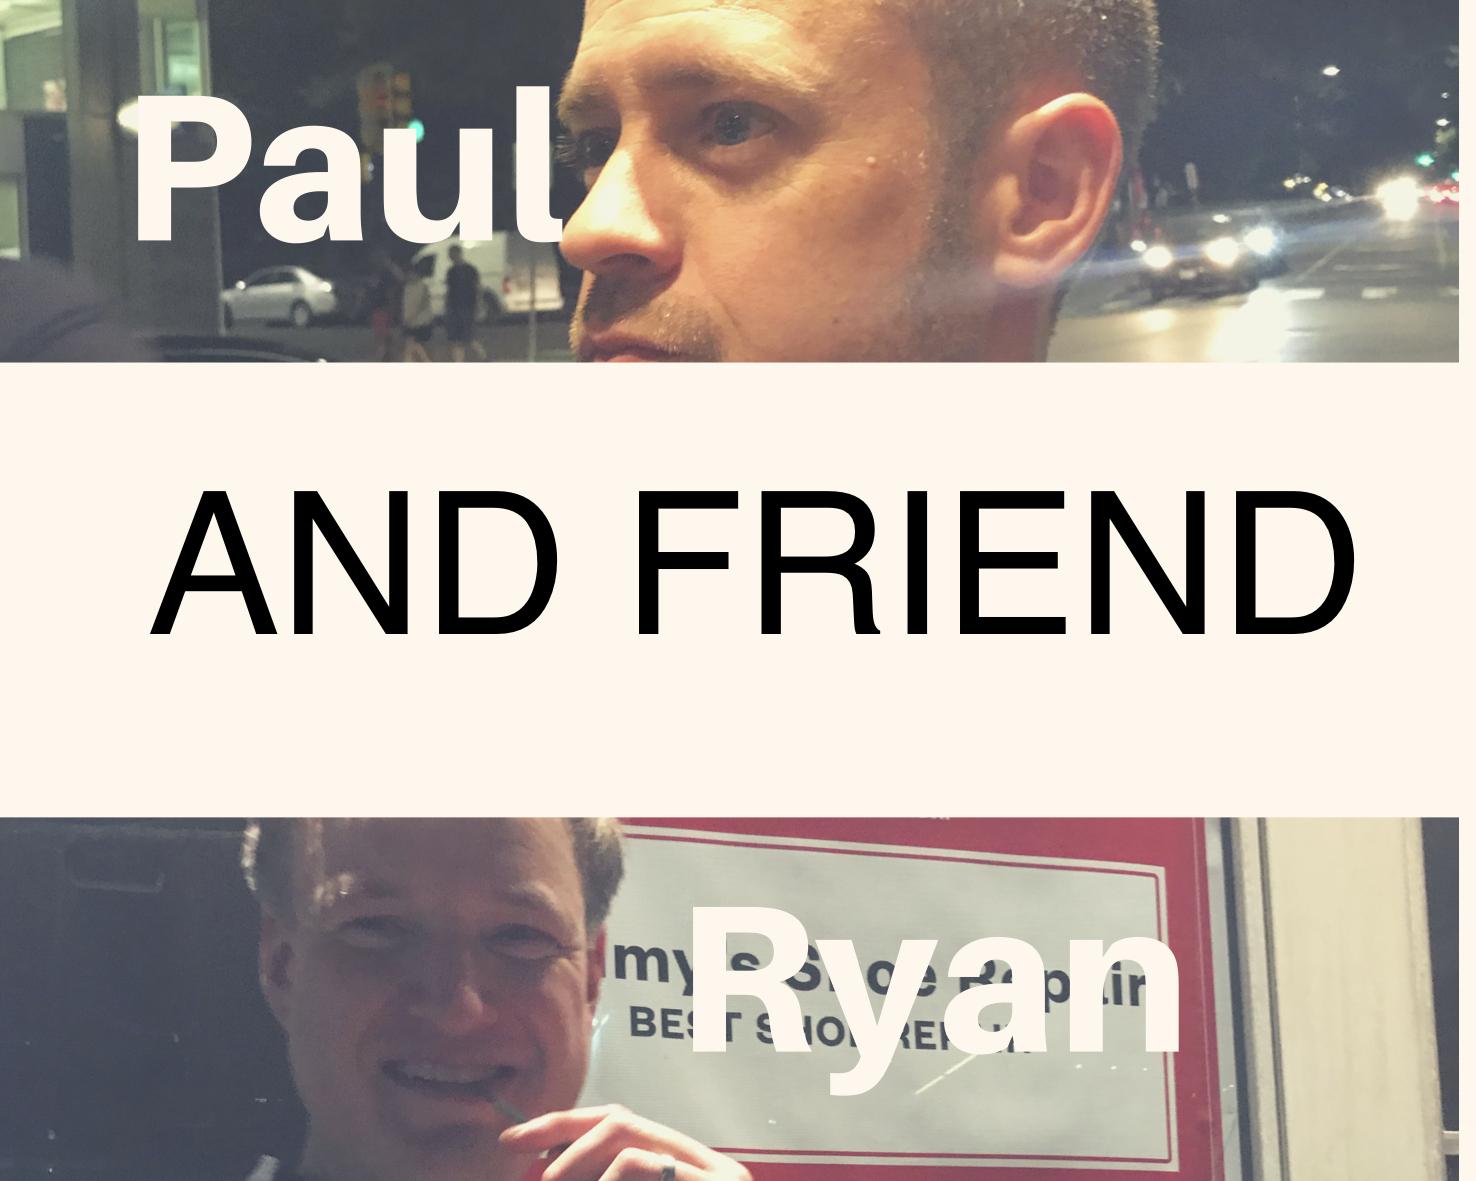 Paul, Ryan and Friend.jpg